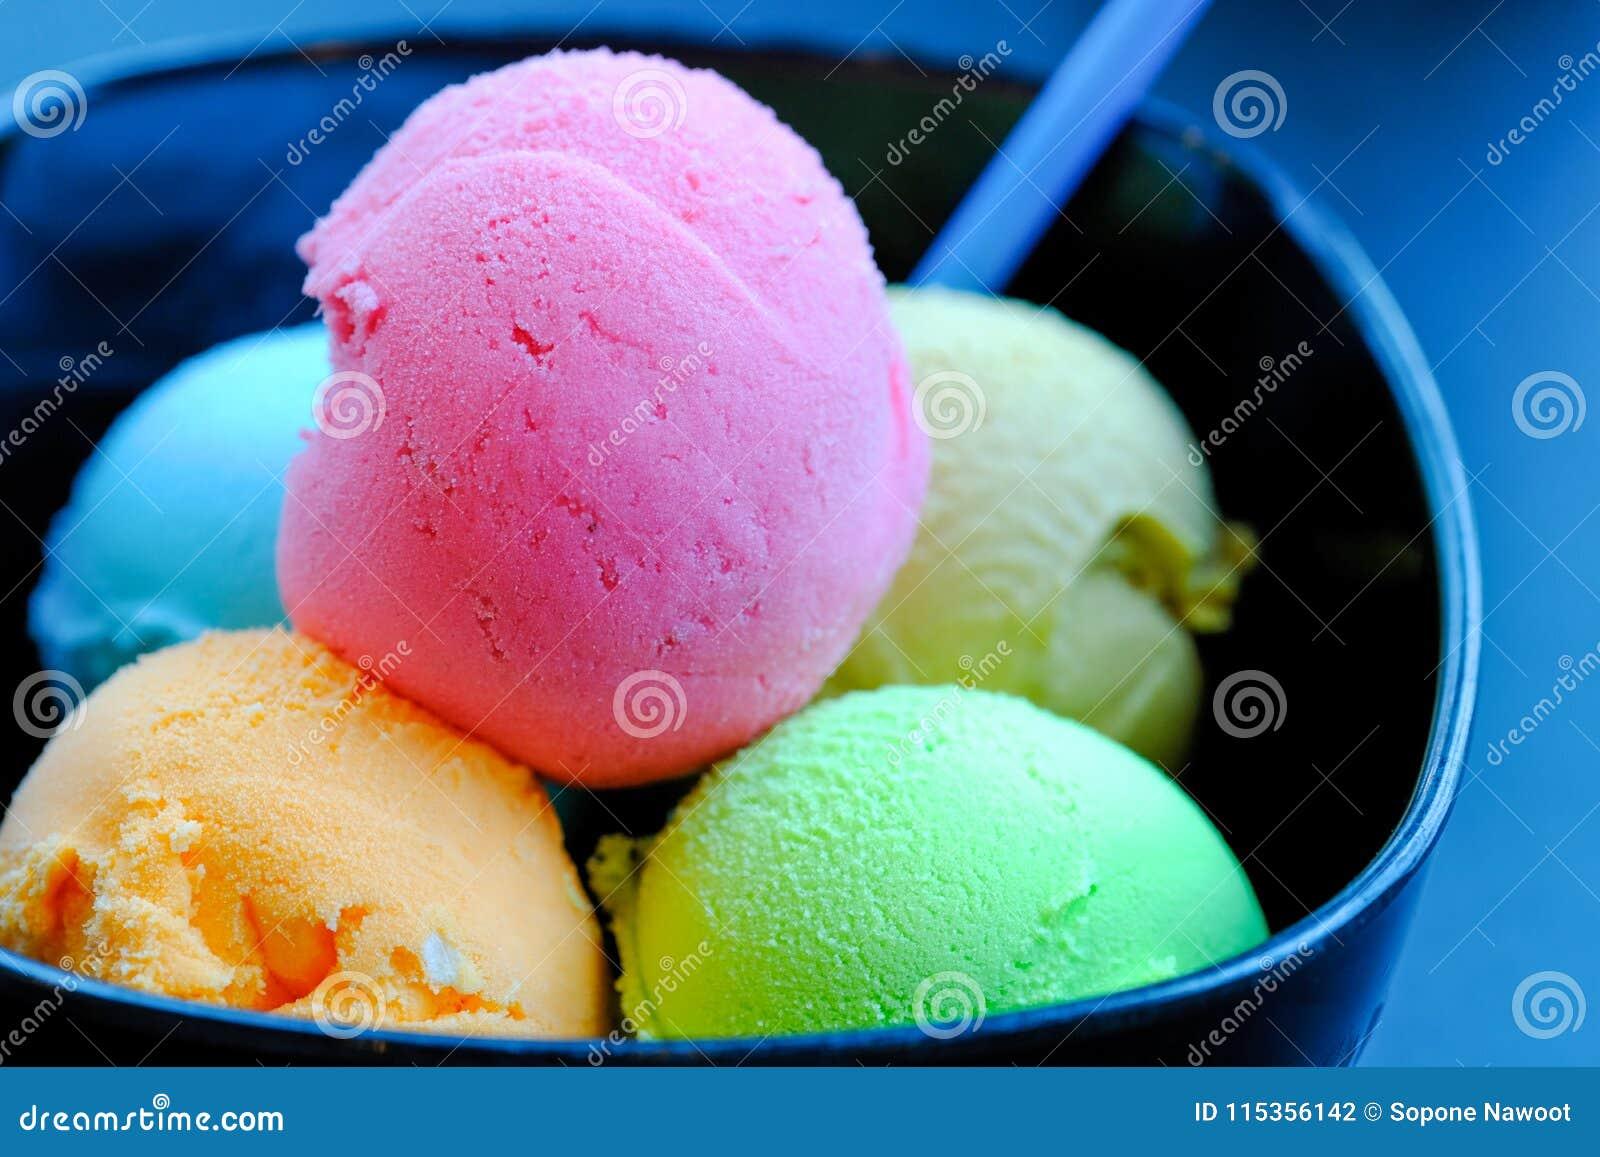 balls of ice cream and sorbet